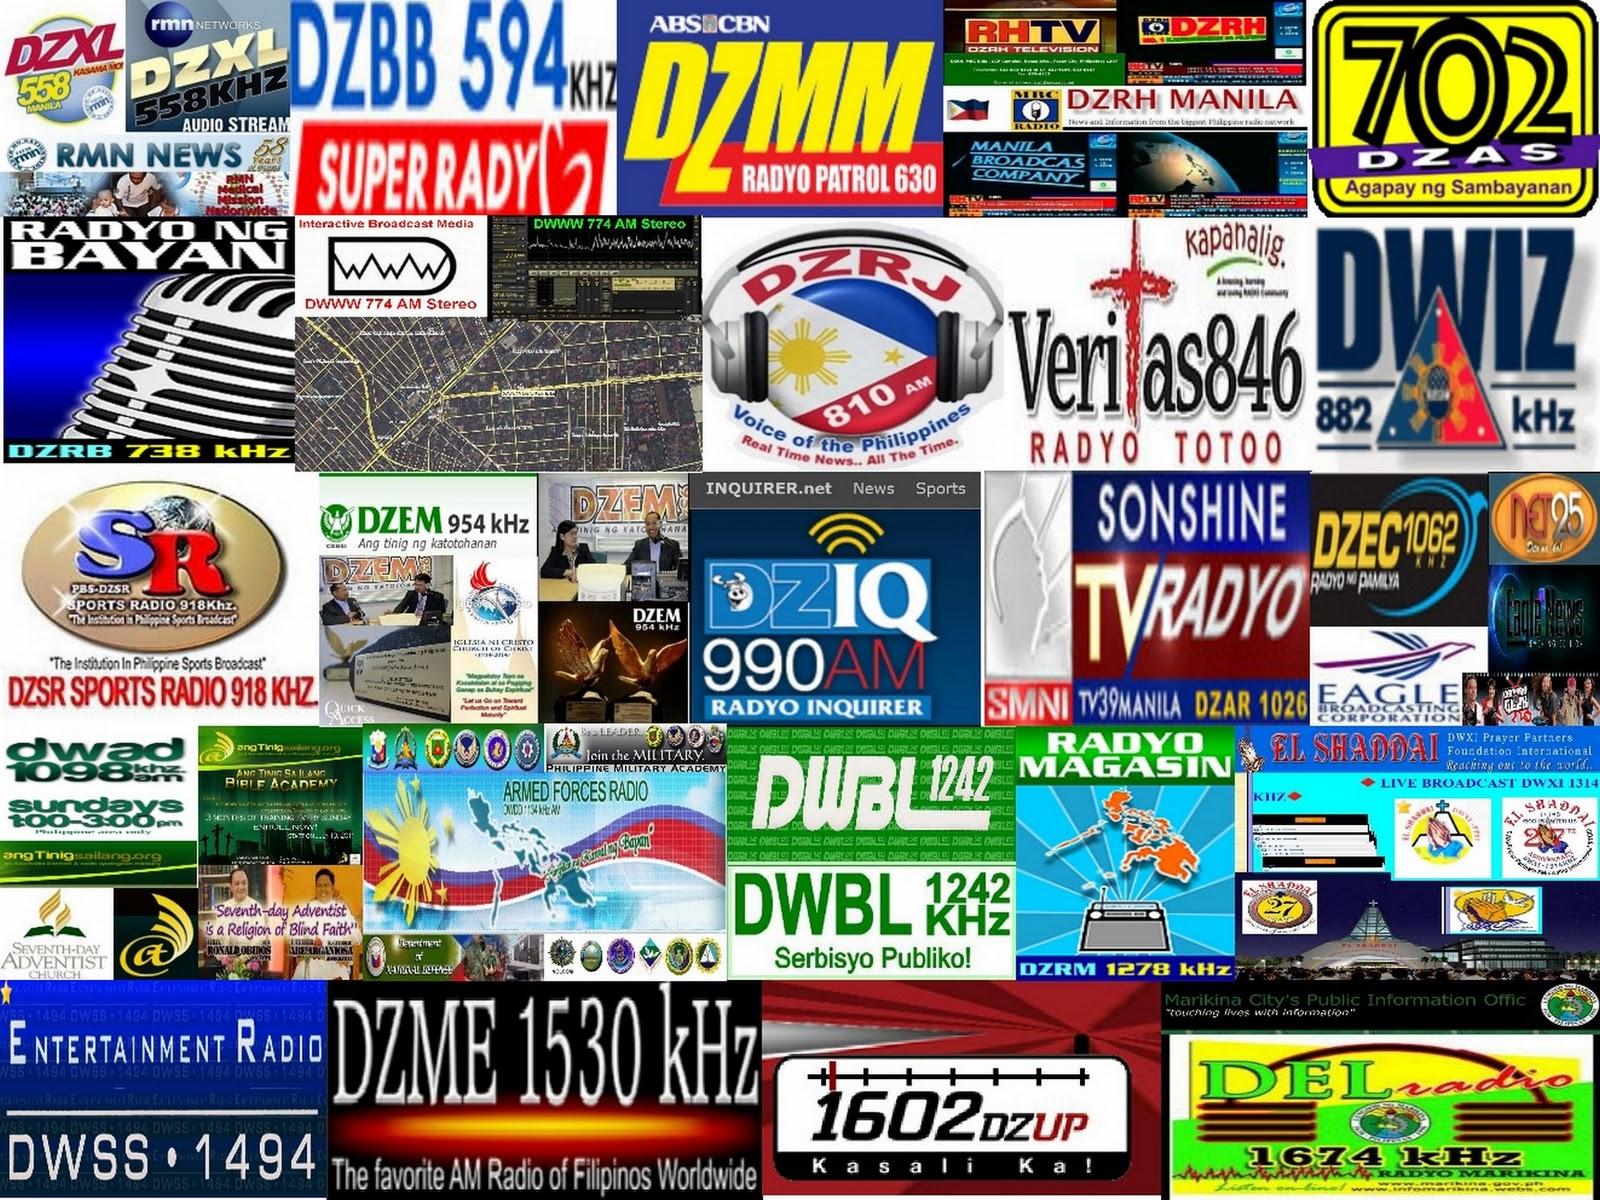 FREE PINOY FAVORITE INTERNET TELERADIO SHOW: Favorite Pinoy AM radio